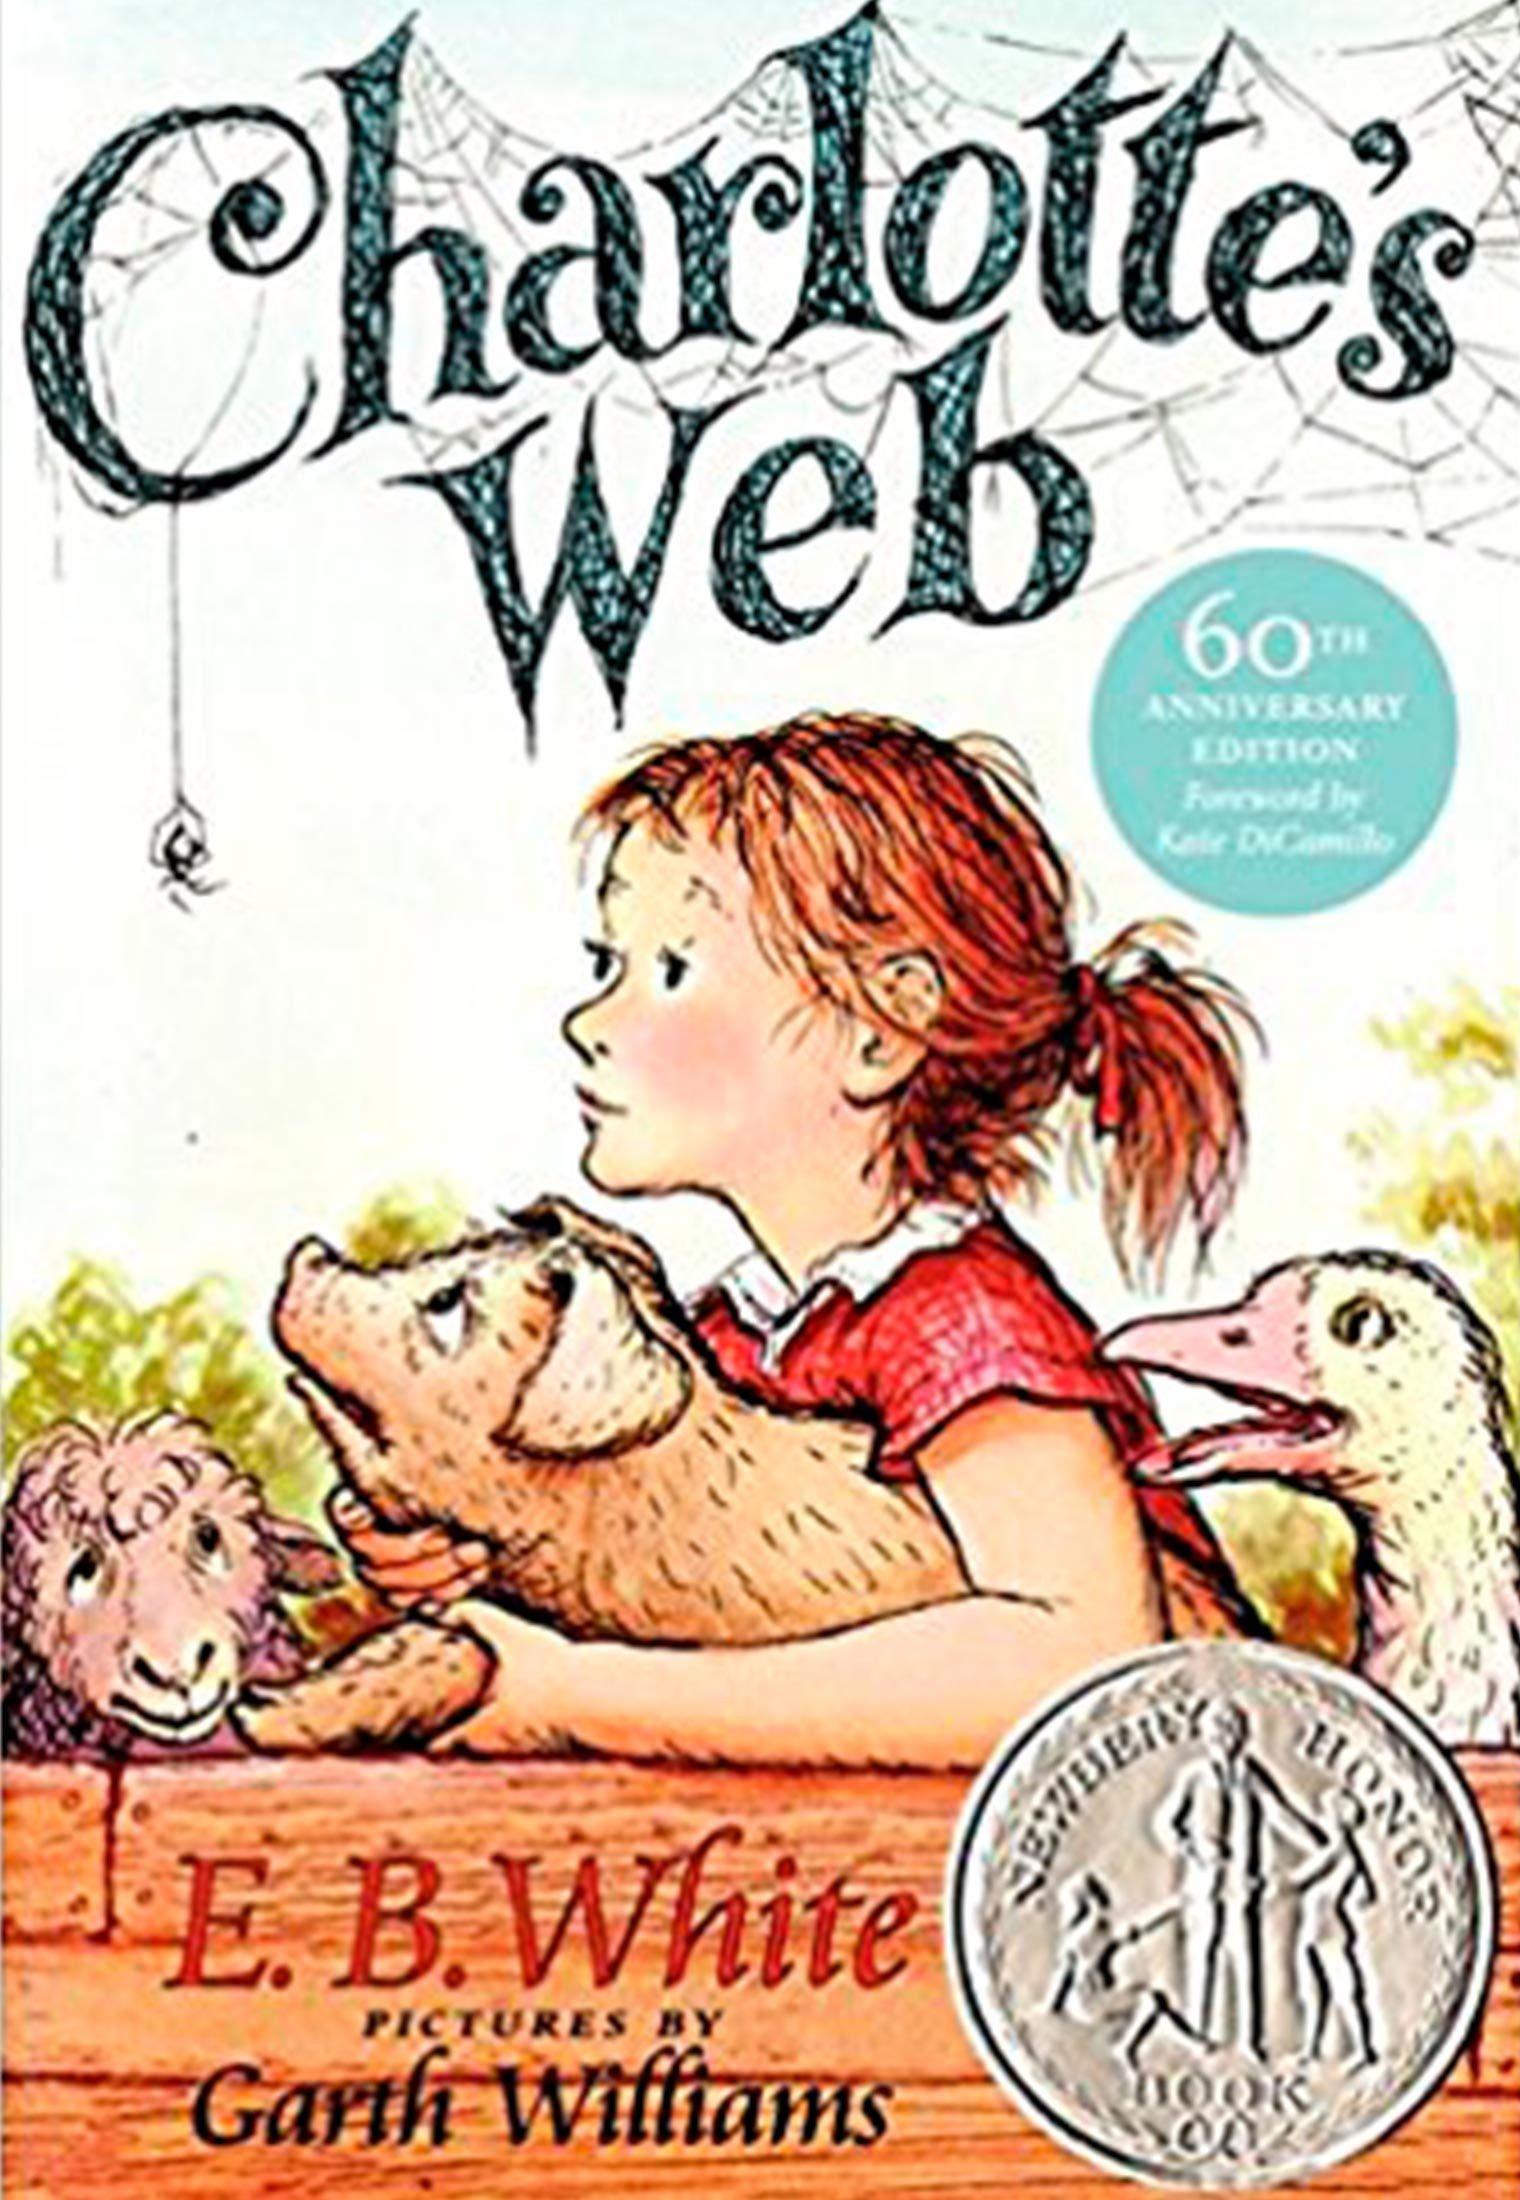 The Best Children's Books Ever Written | Reader's Digest